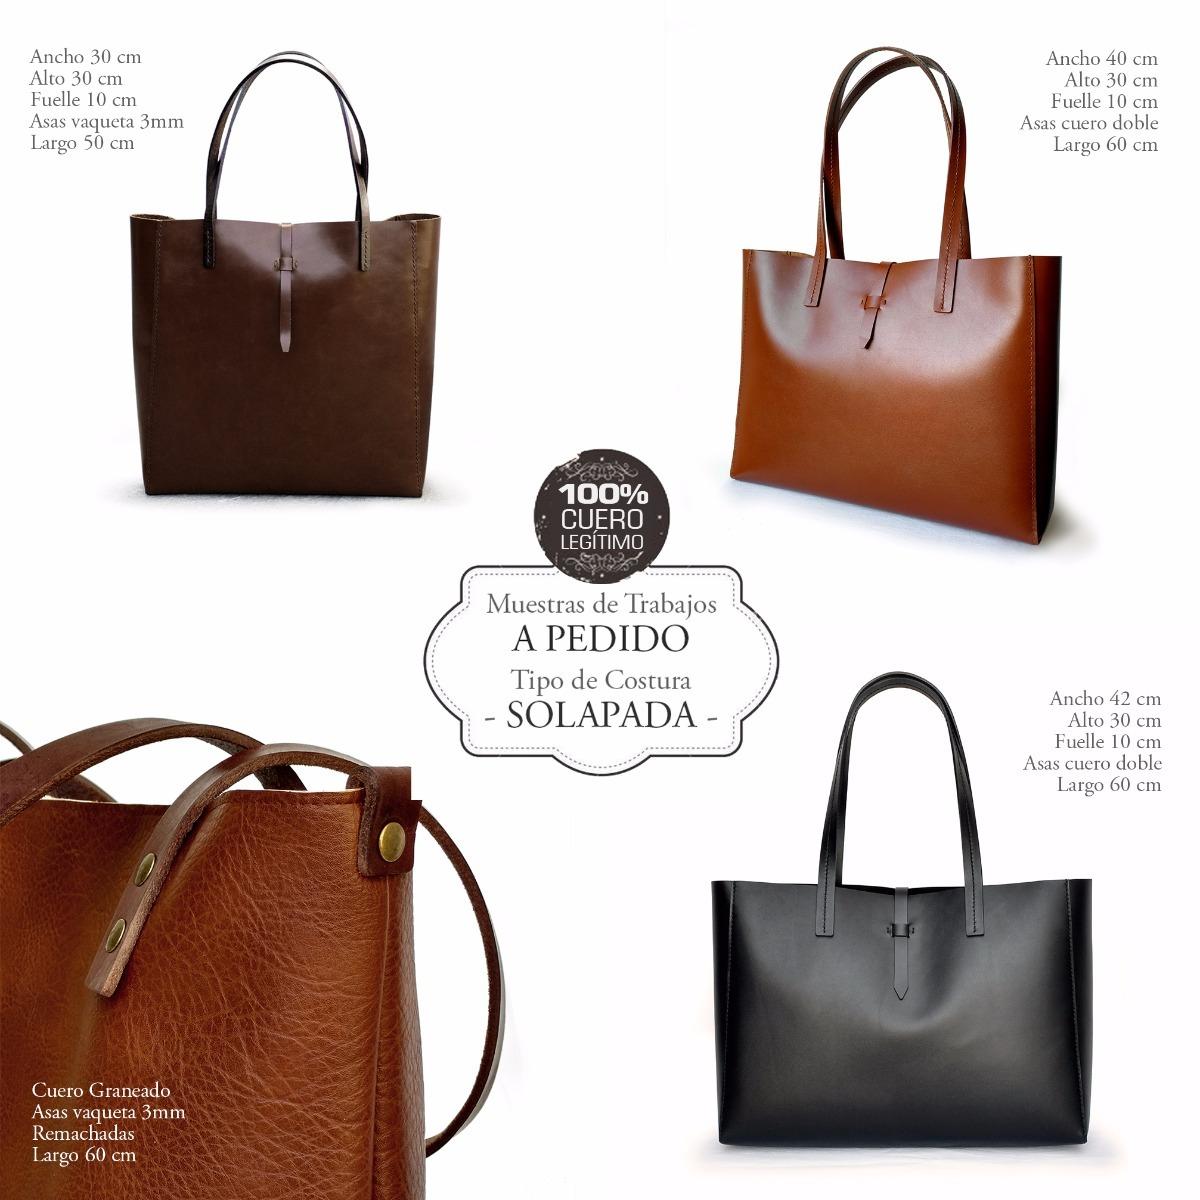 Cartera Tote Bag Shopper -100% Cuero Vacuno- Hecha A Mano